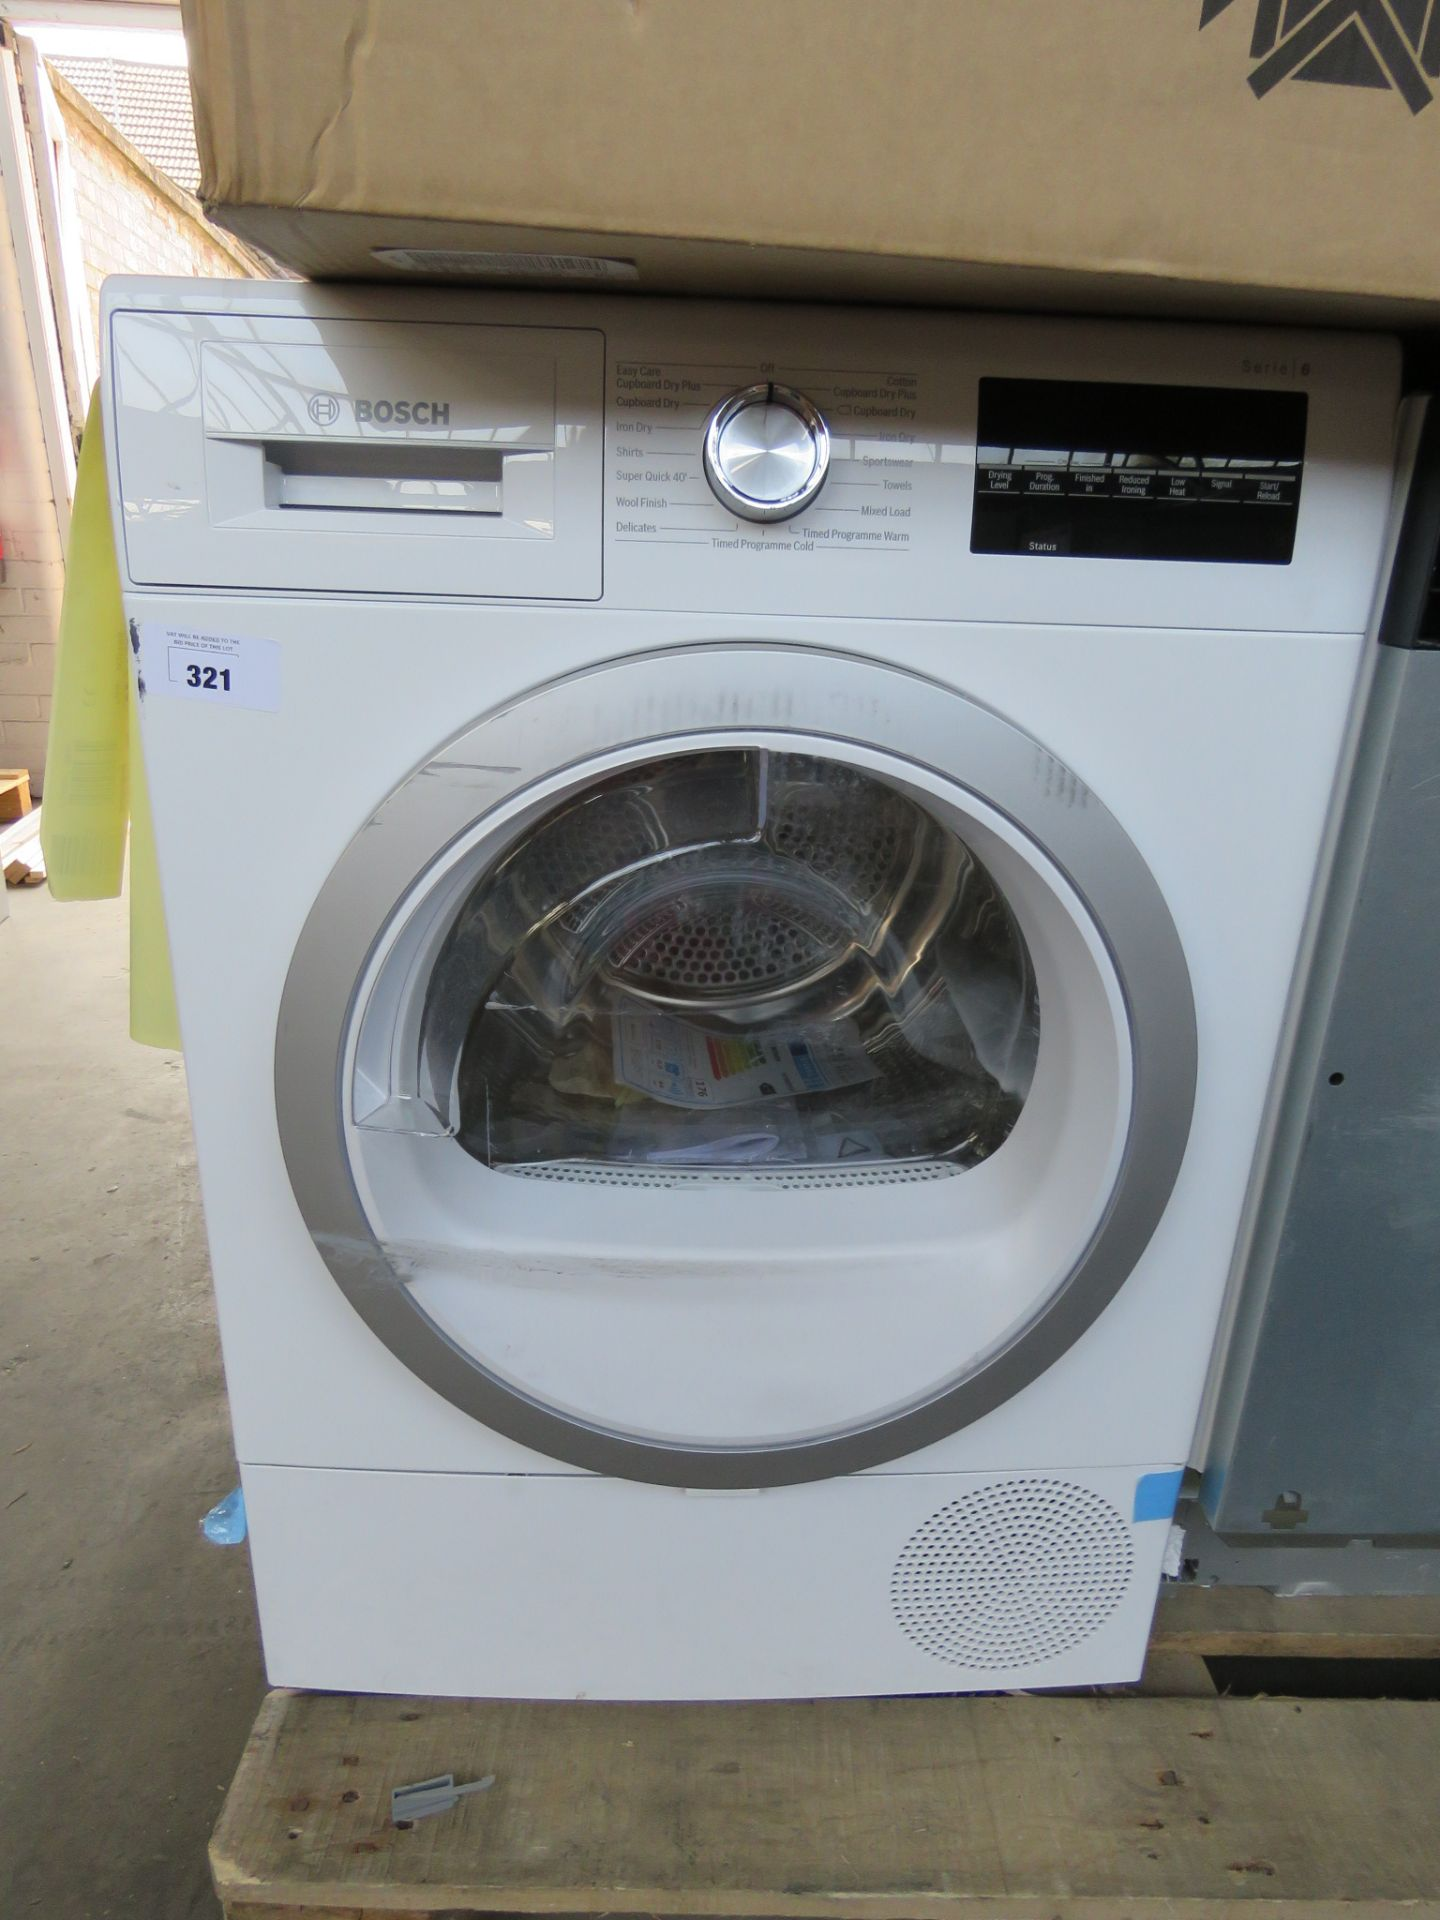 WTR88T81GBB Bosch Tumble dryer